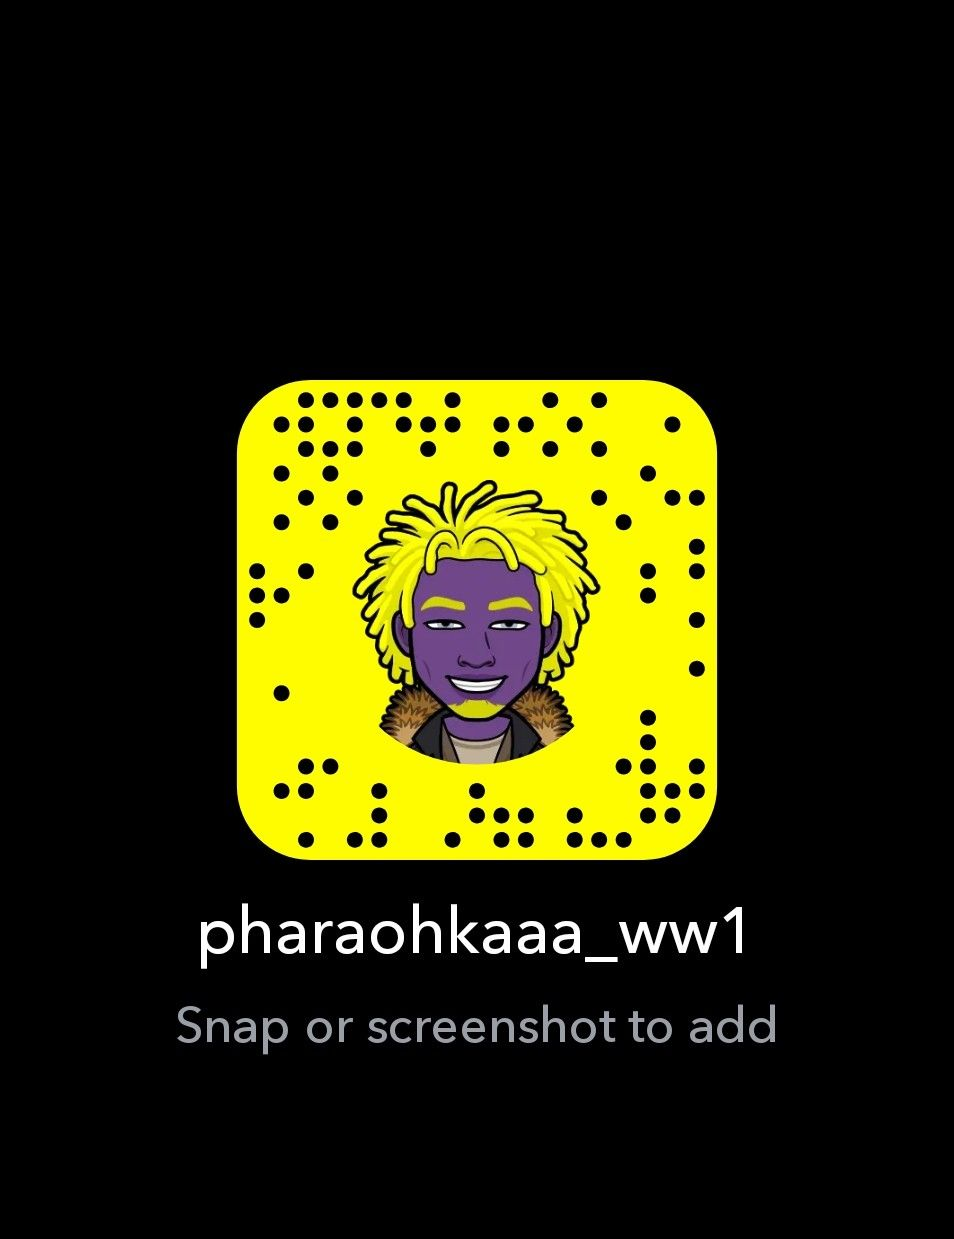 Fastest Growing Snapchat Promotion In 2020 Snapchat Snapchat Premium Snapchat Account